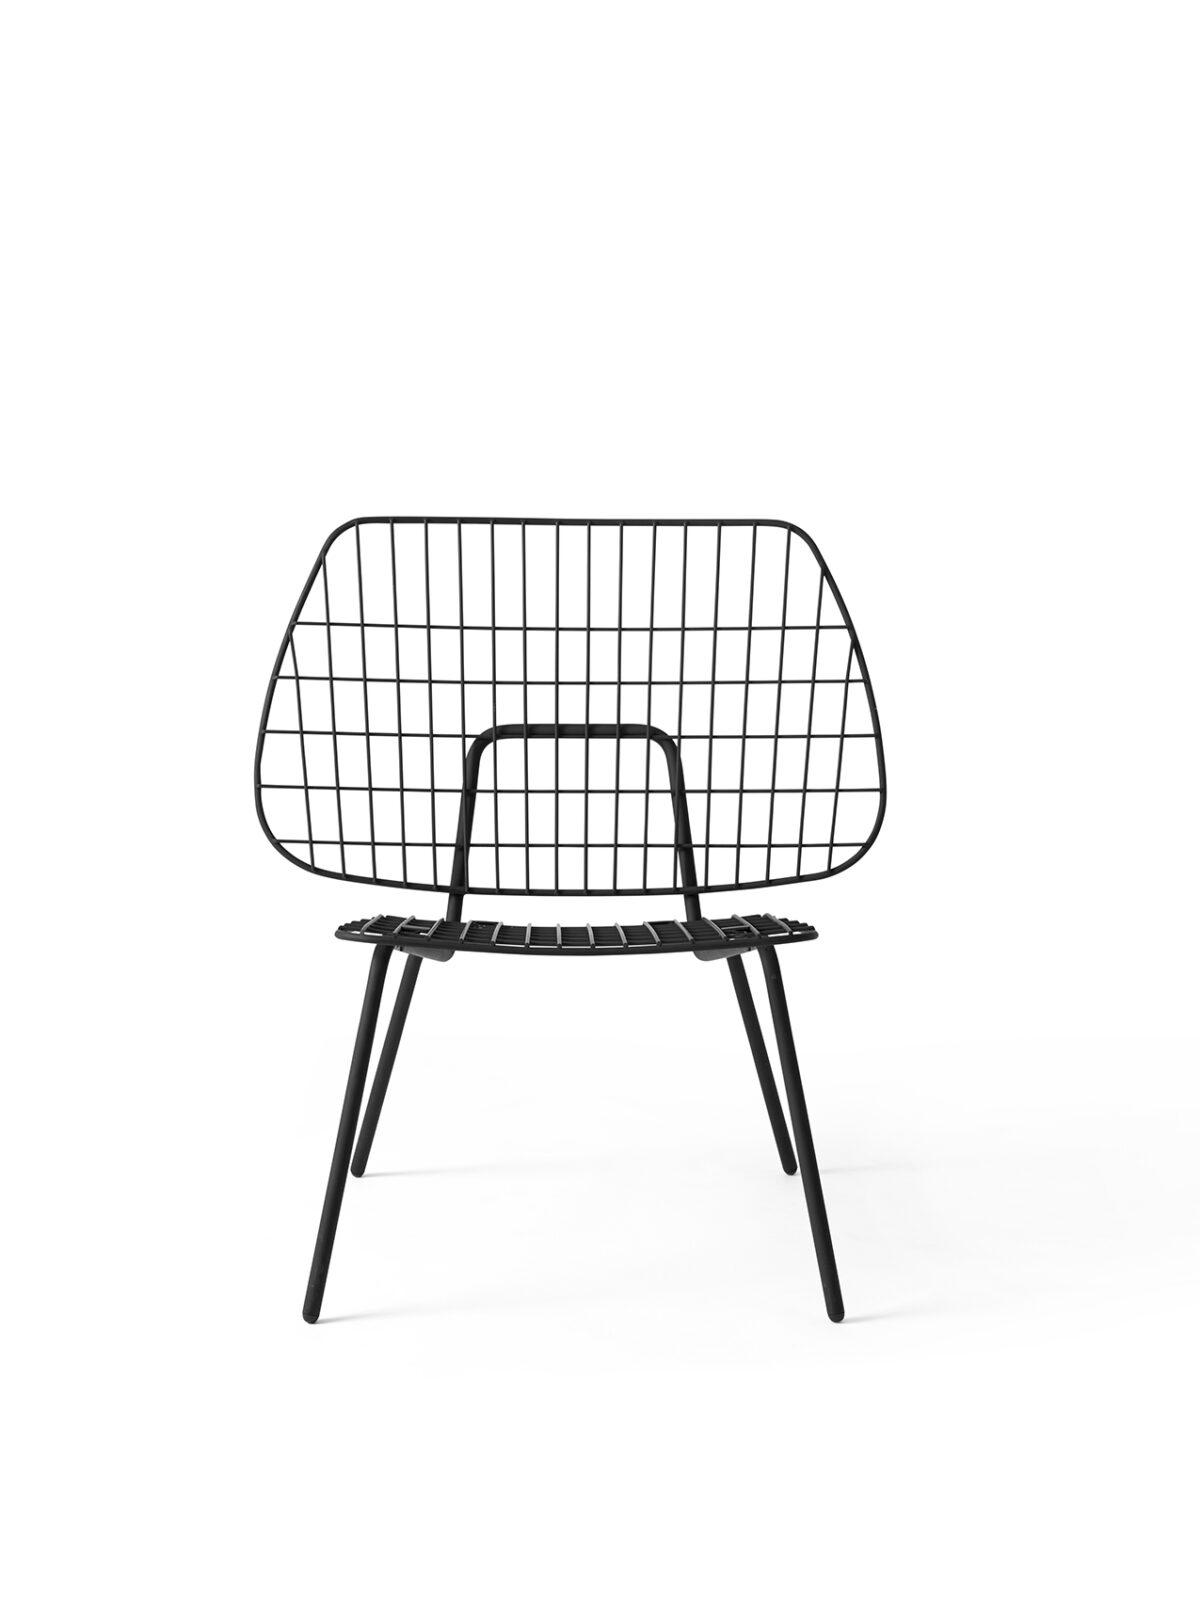 9500539 WM String Lounge Chair Black 012019 06 24 09 18 46 207 1